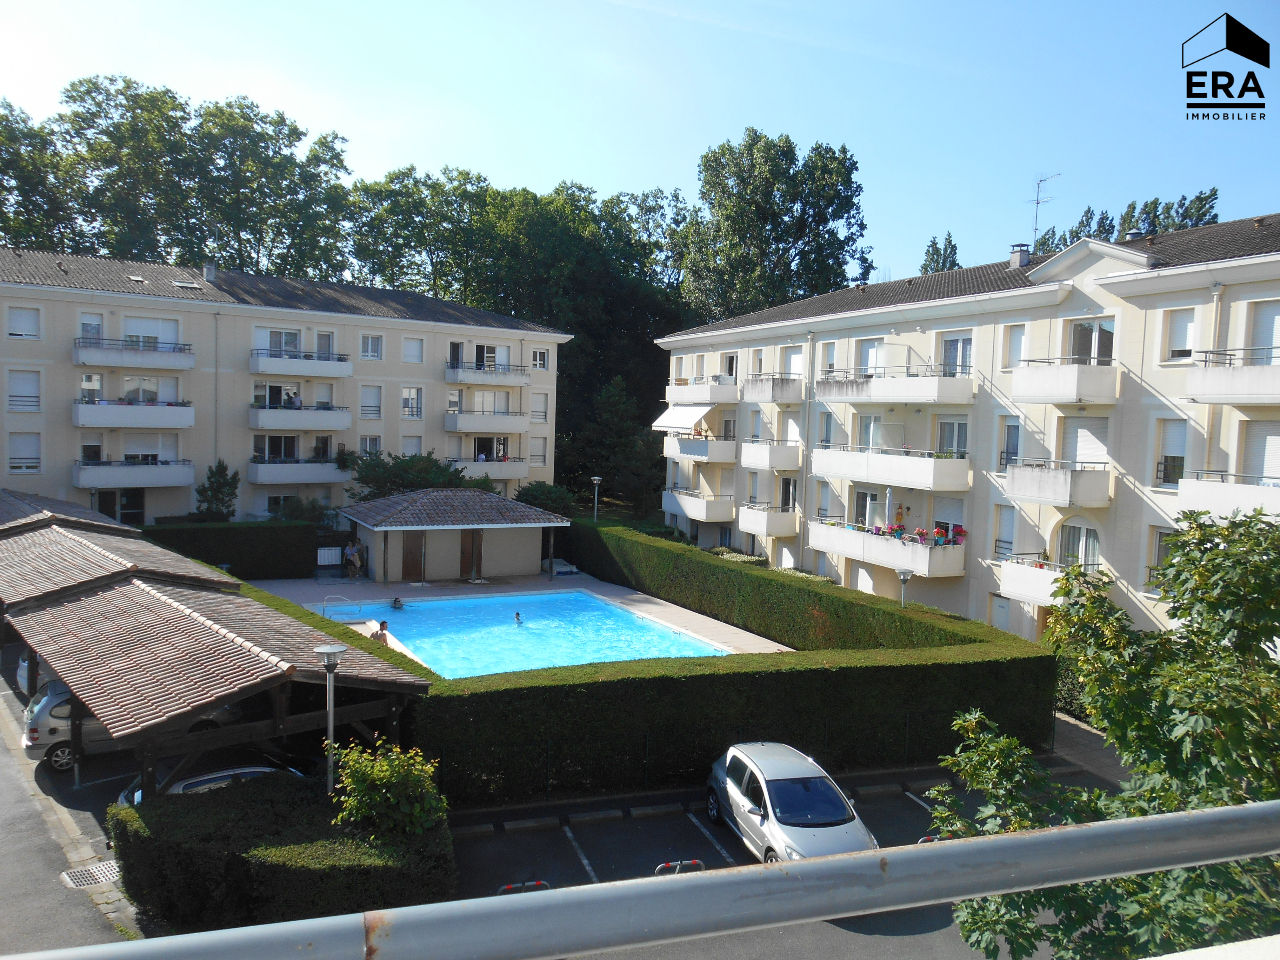 Vente Appartement 2 pièces BLANQUEFORT 33290